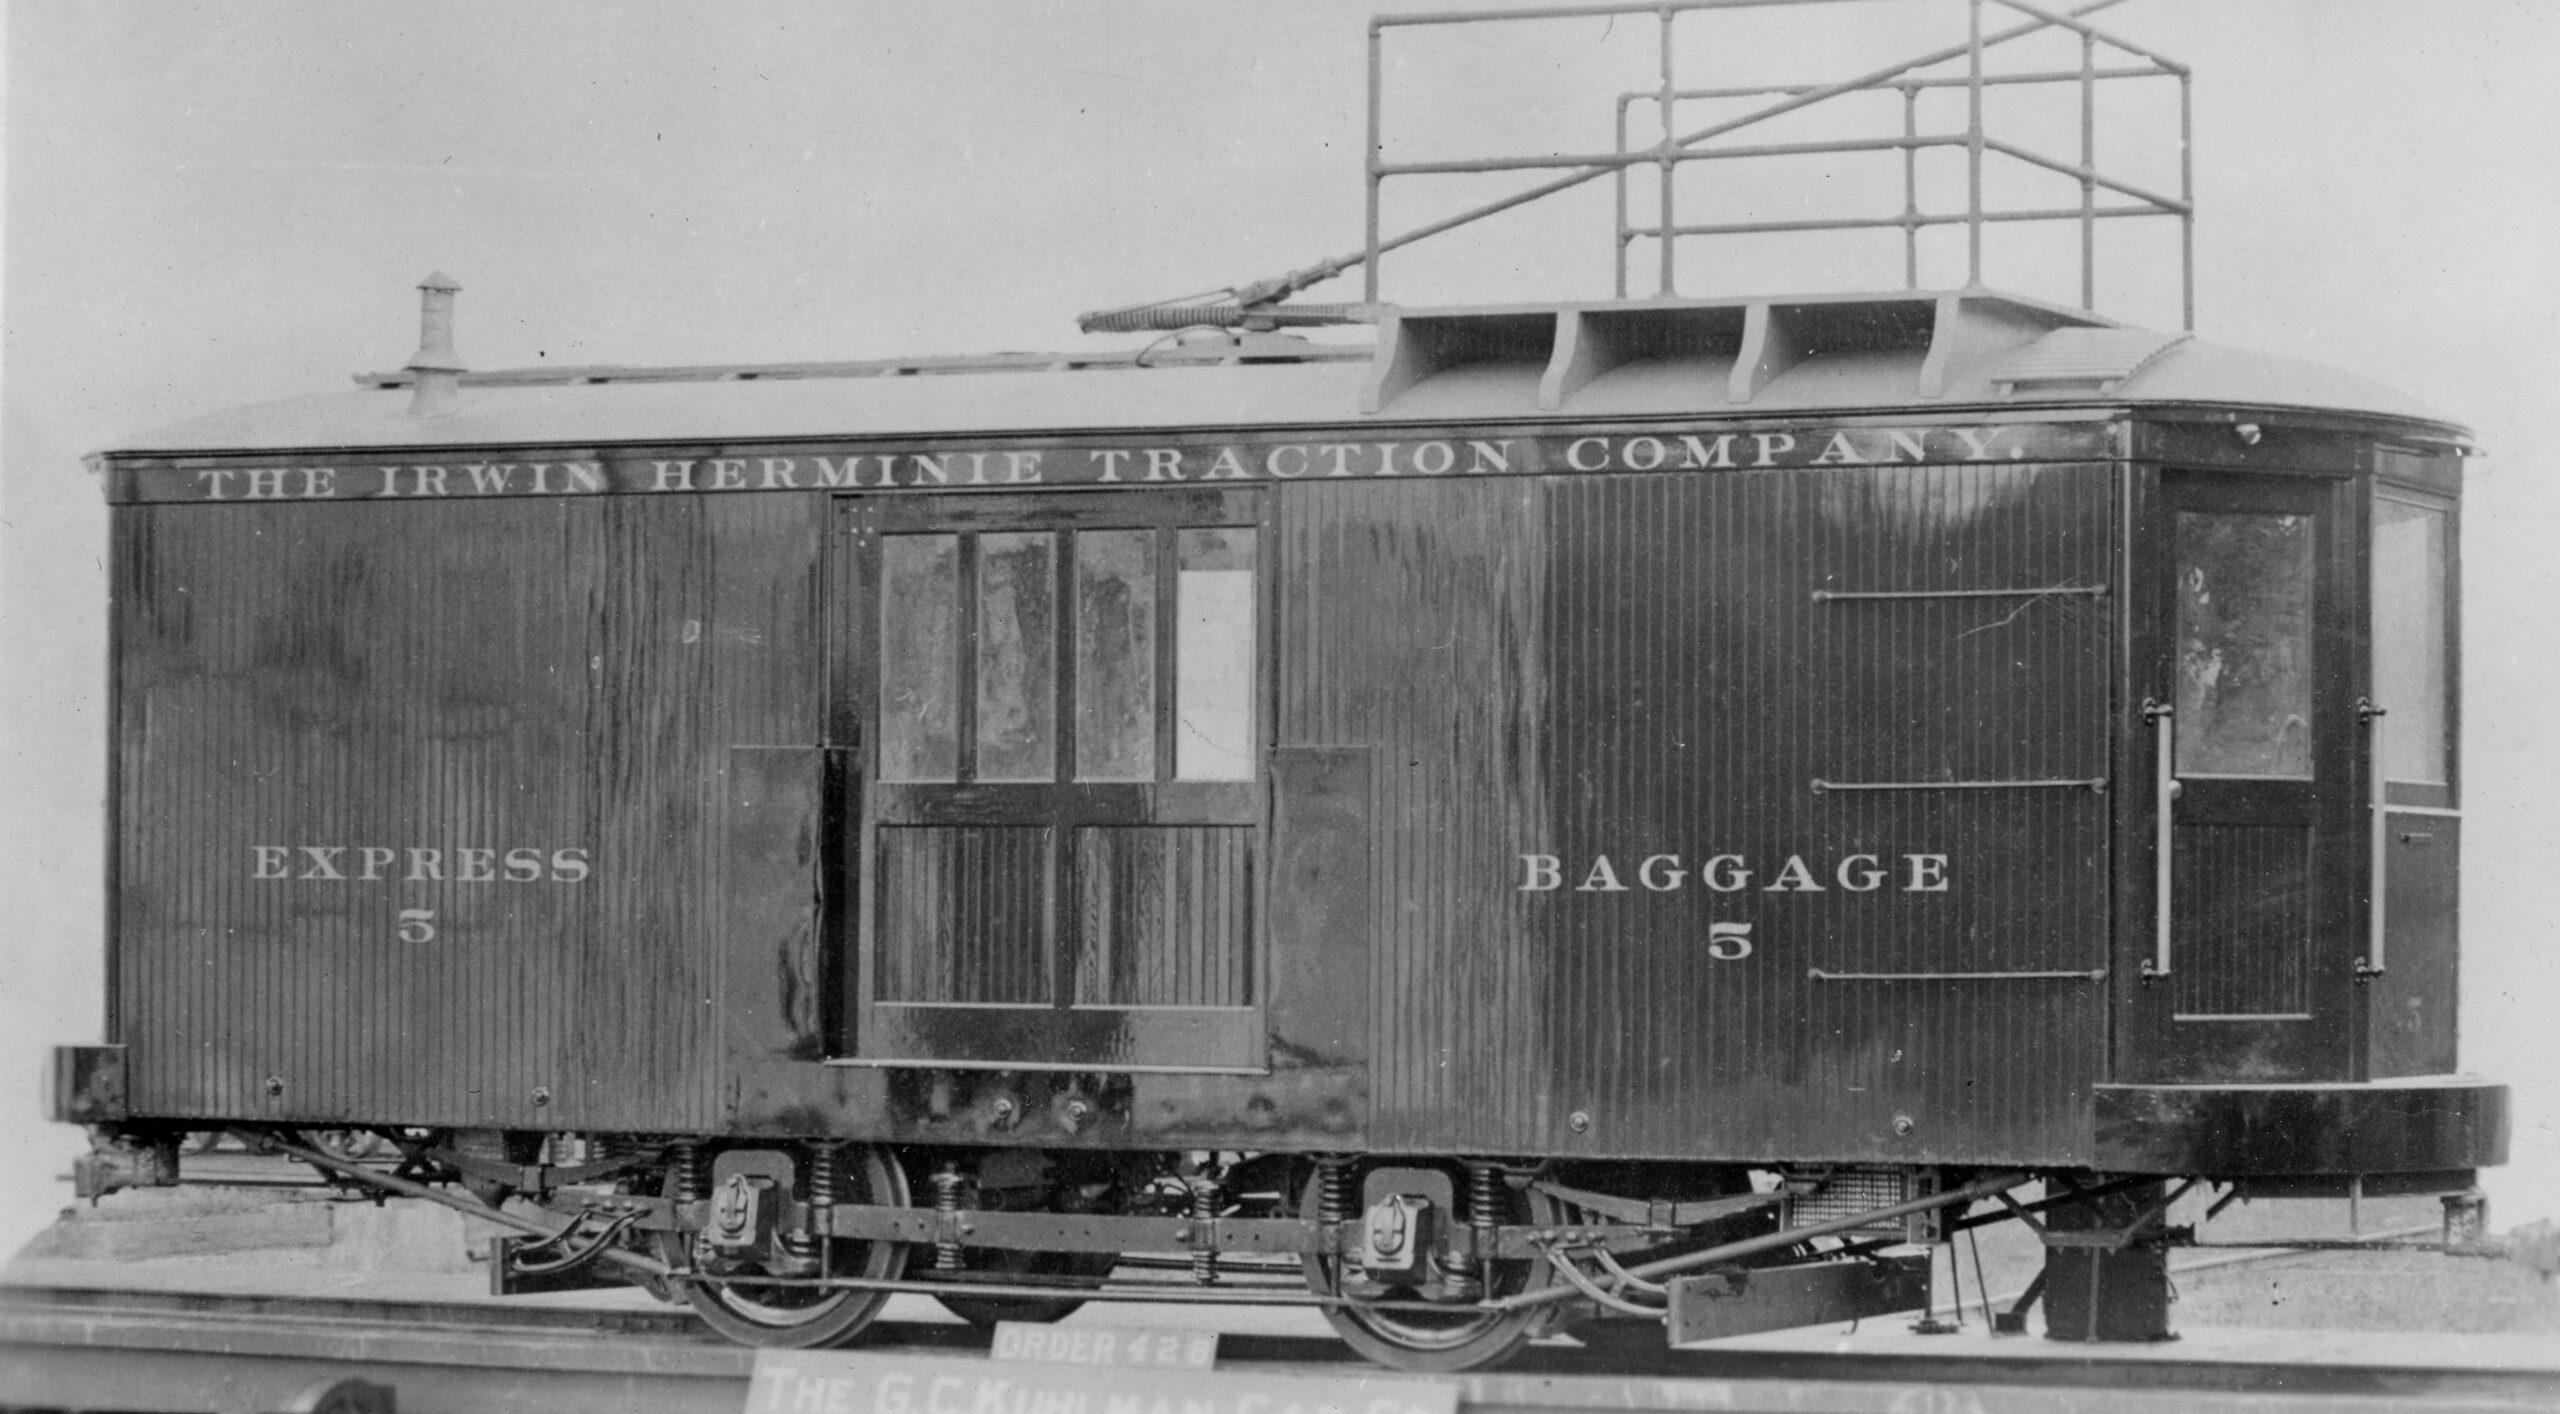 Irwin Hermine Traction Company   Cleveland Ohio   Express Freight Motor #5    1904   G C Kuhlman Company